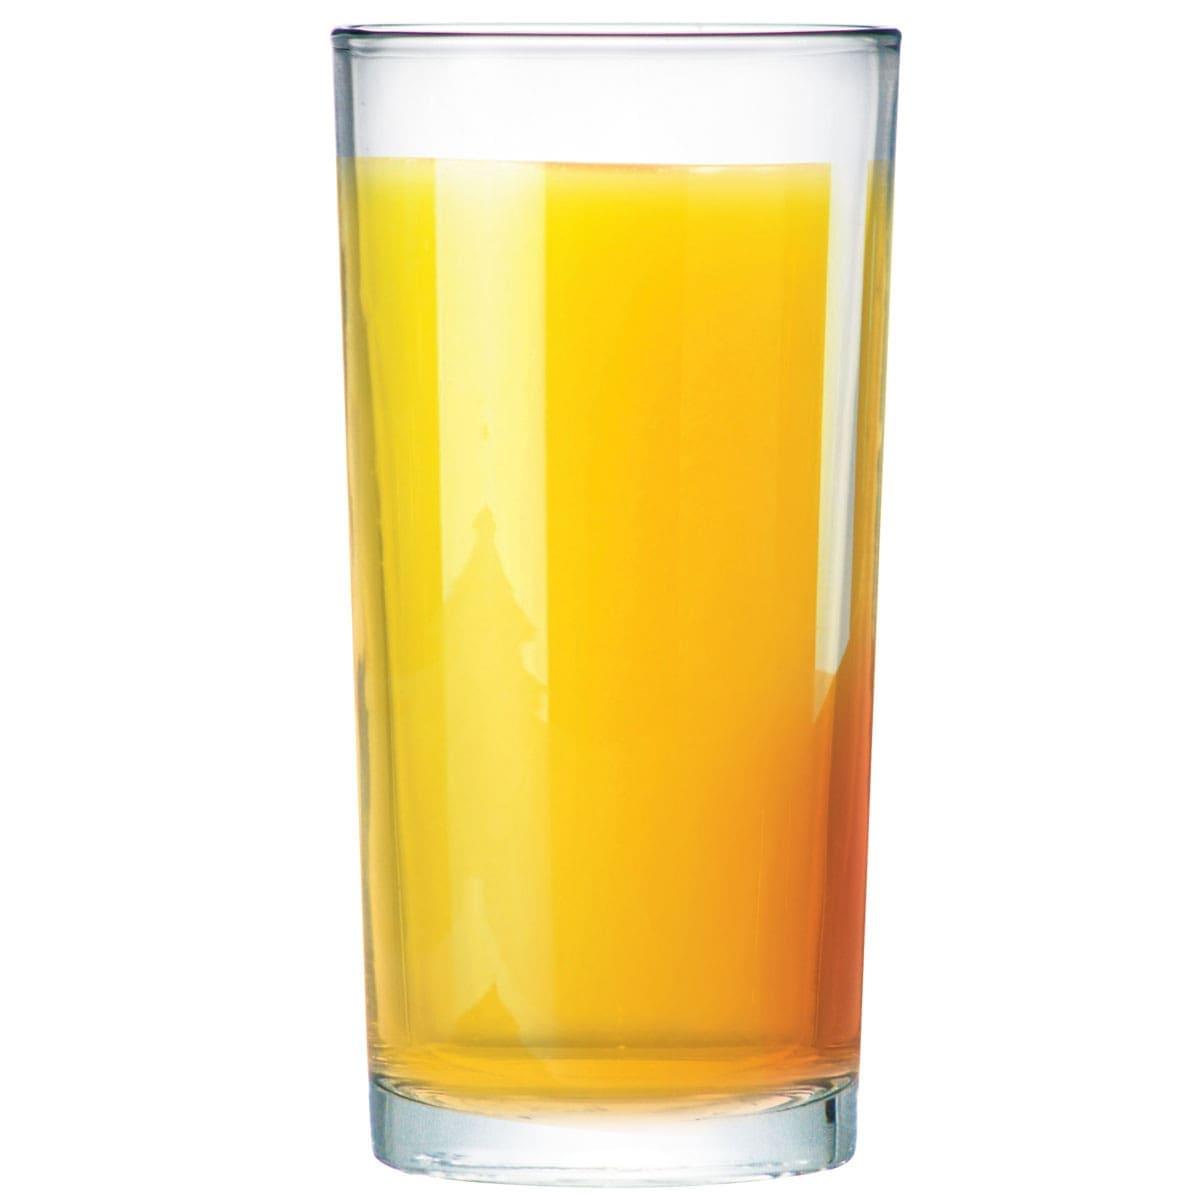 Copo Long Drink Multiuso Vidro 255ml R$4 a unid. (Caixa com 24 unidades)